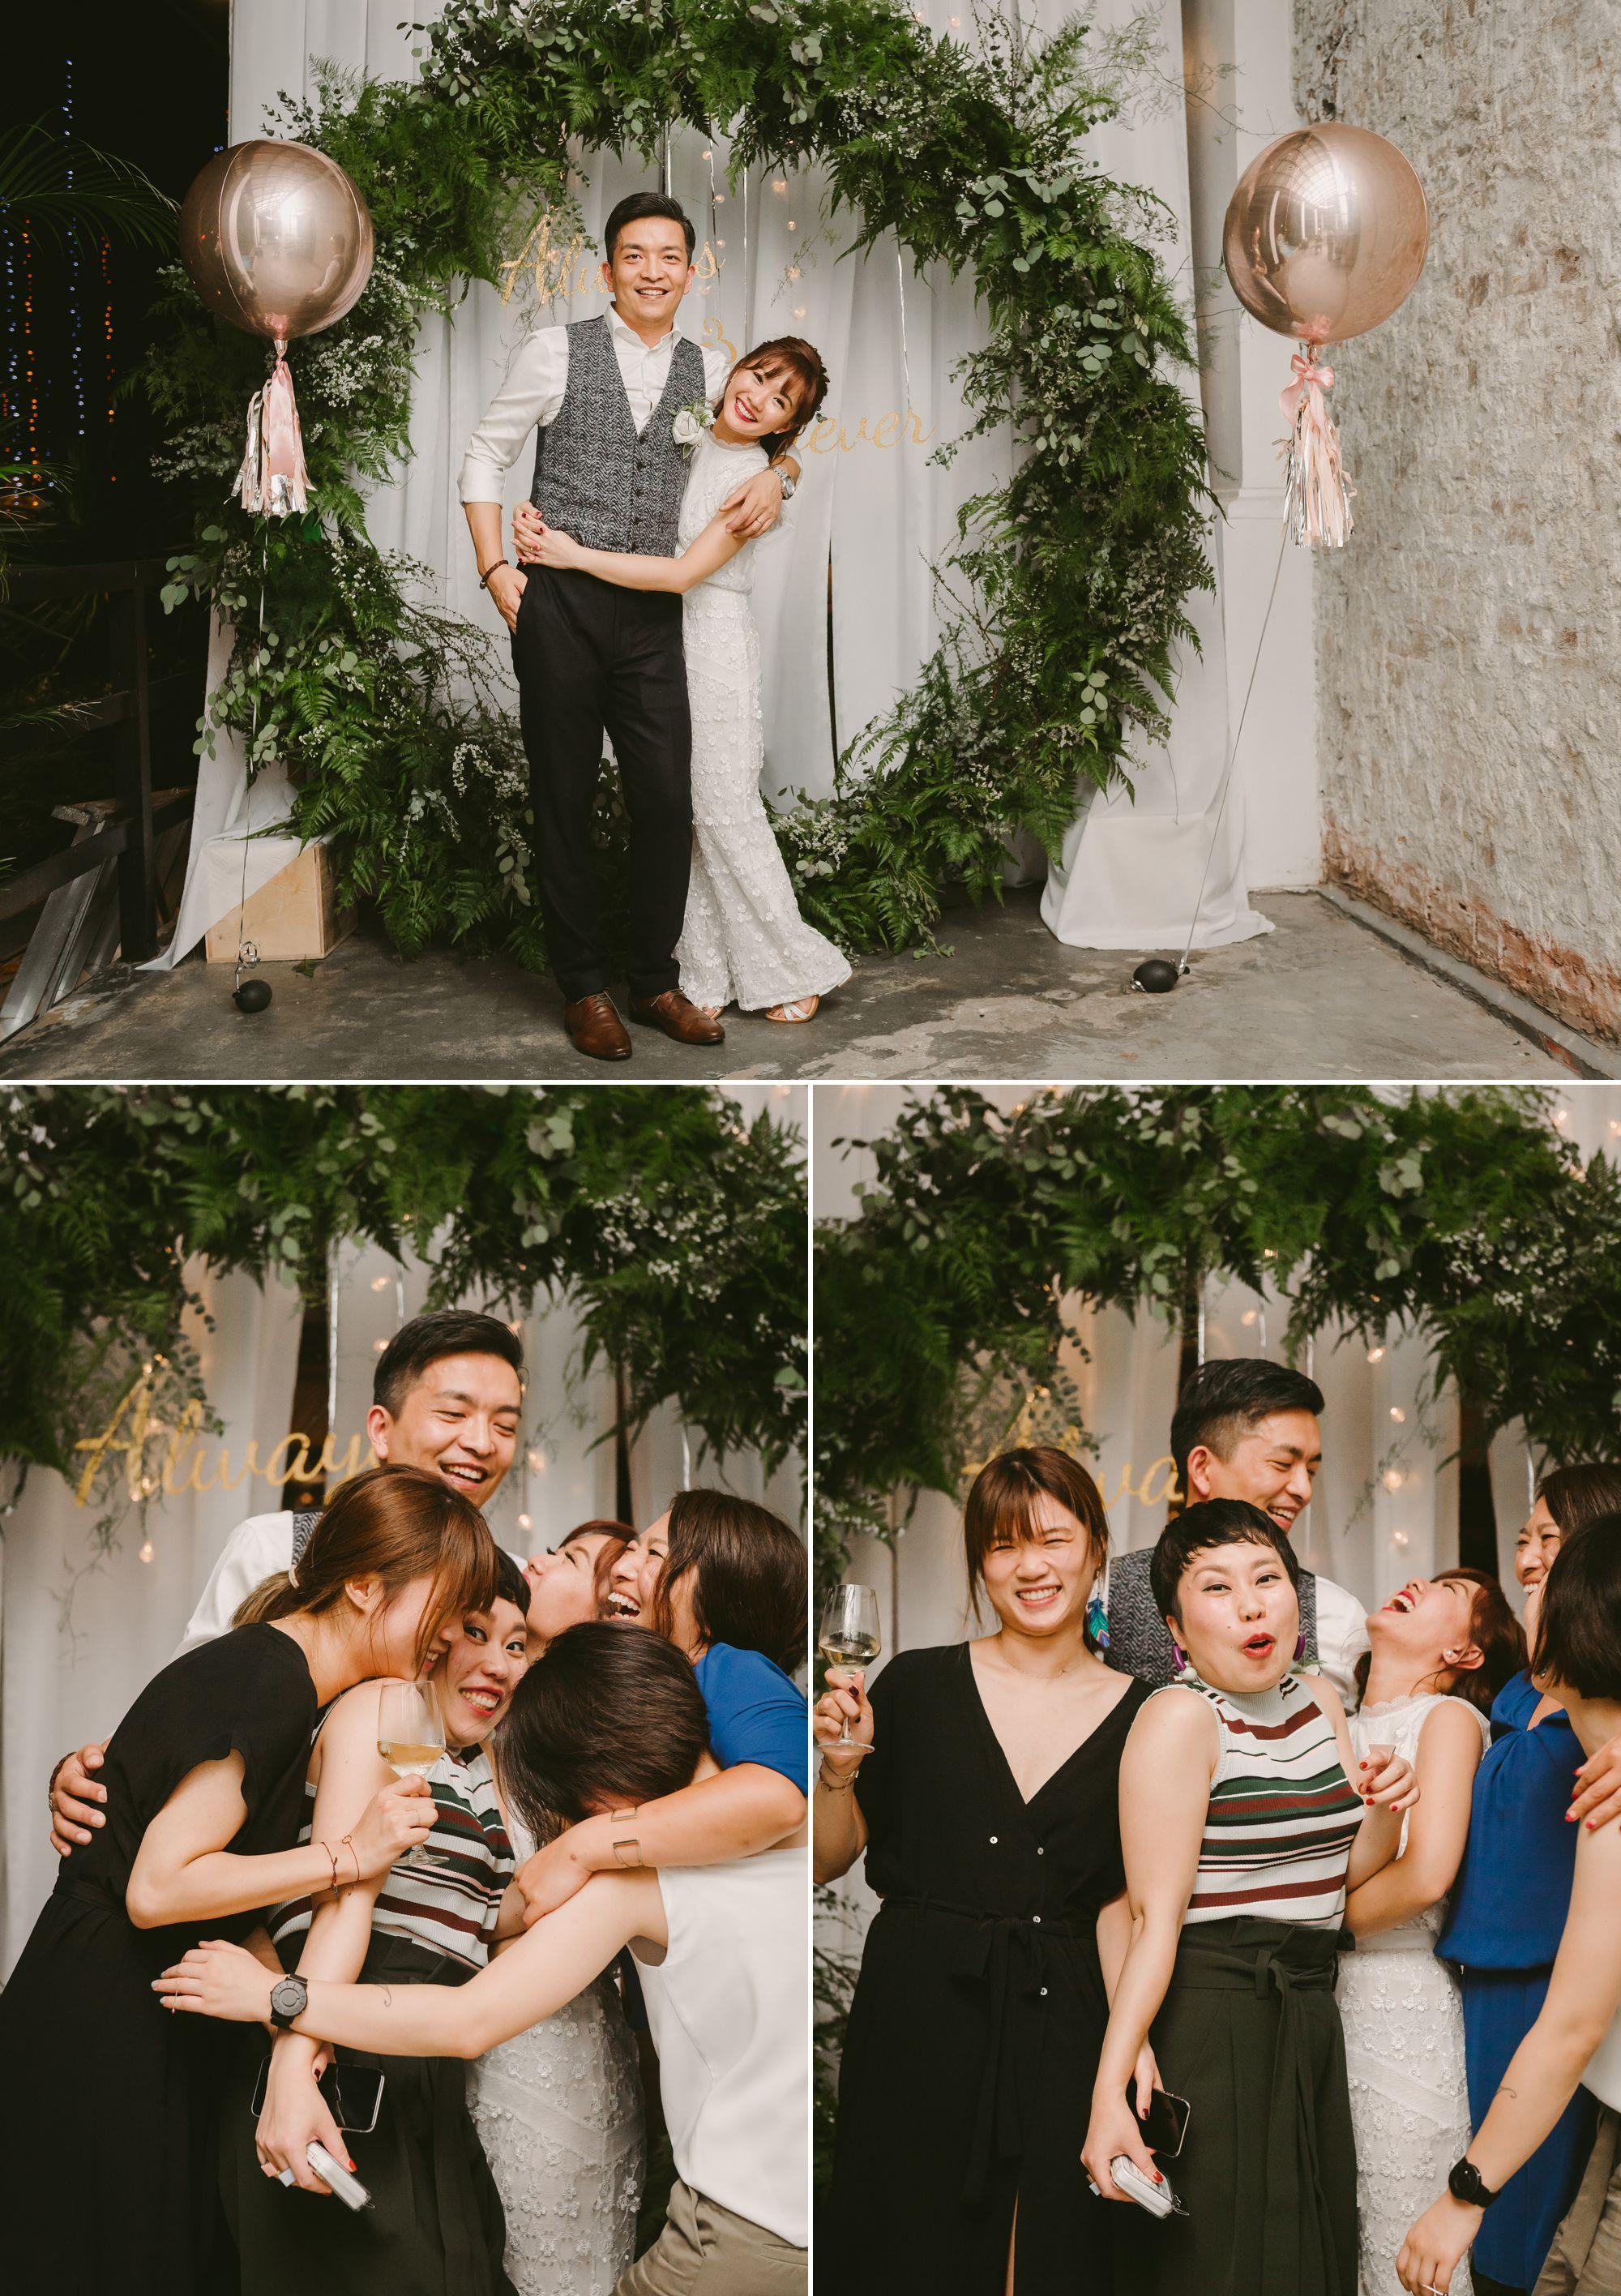 wedding_photography 44.jpg